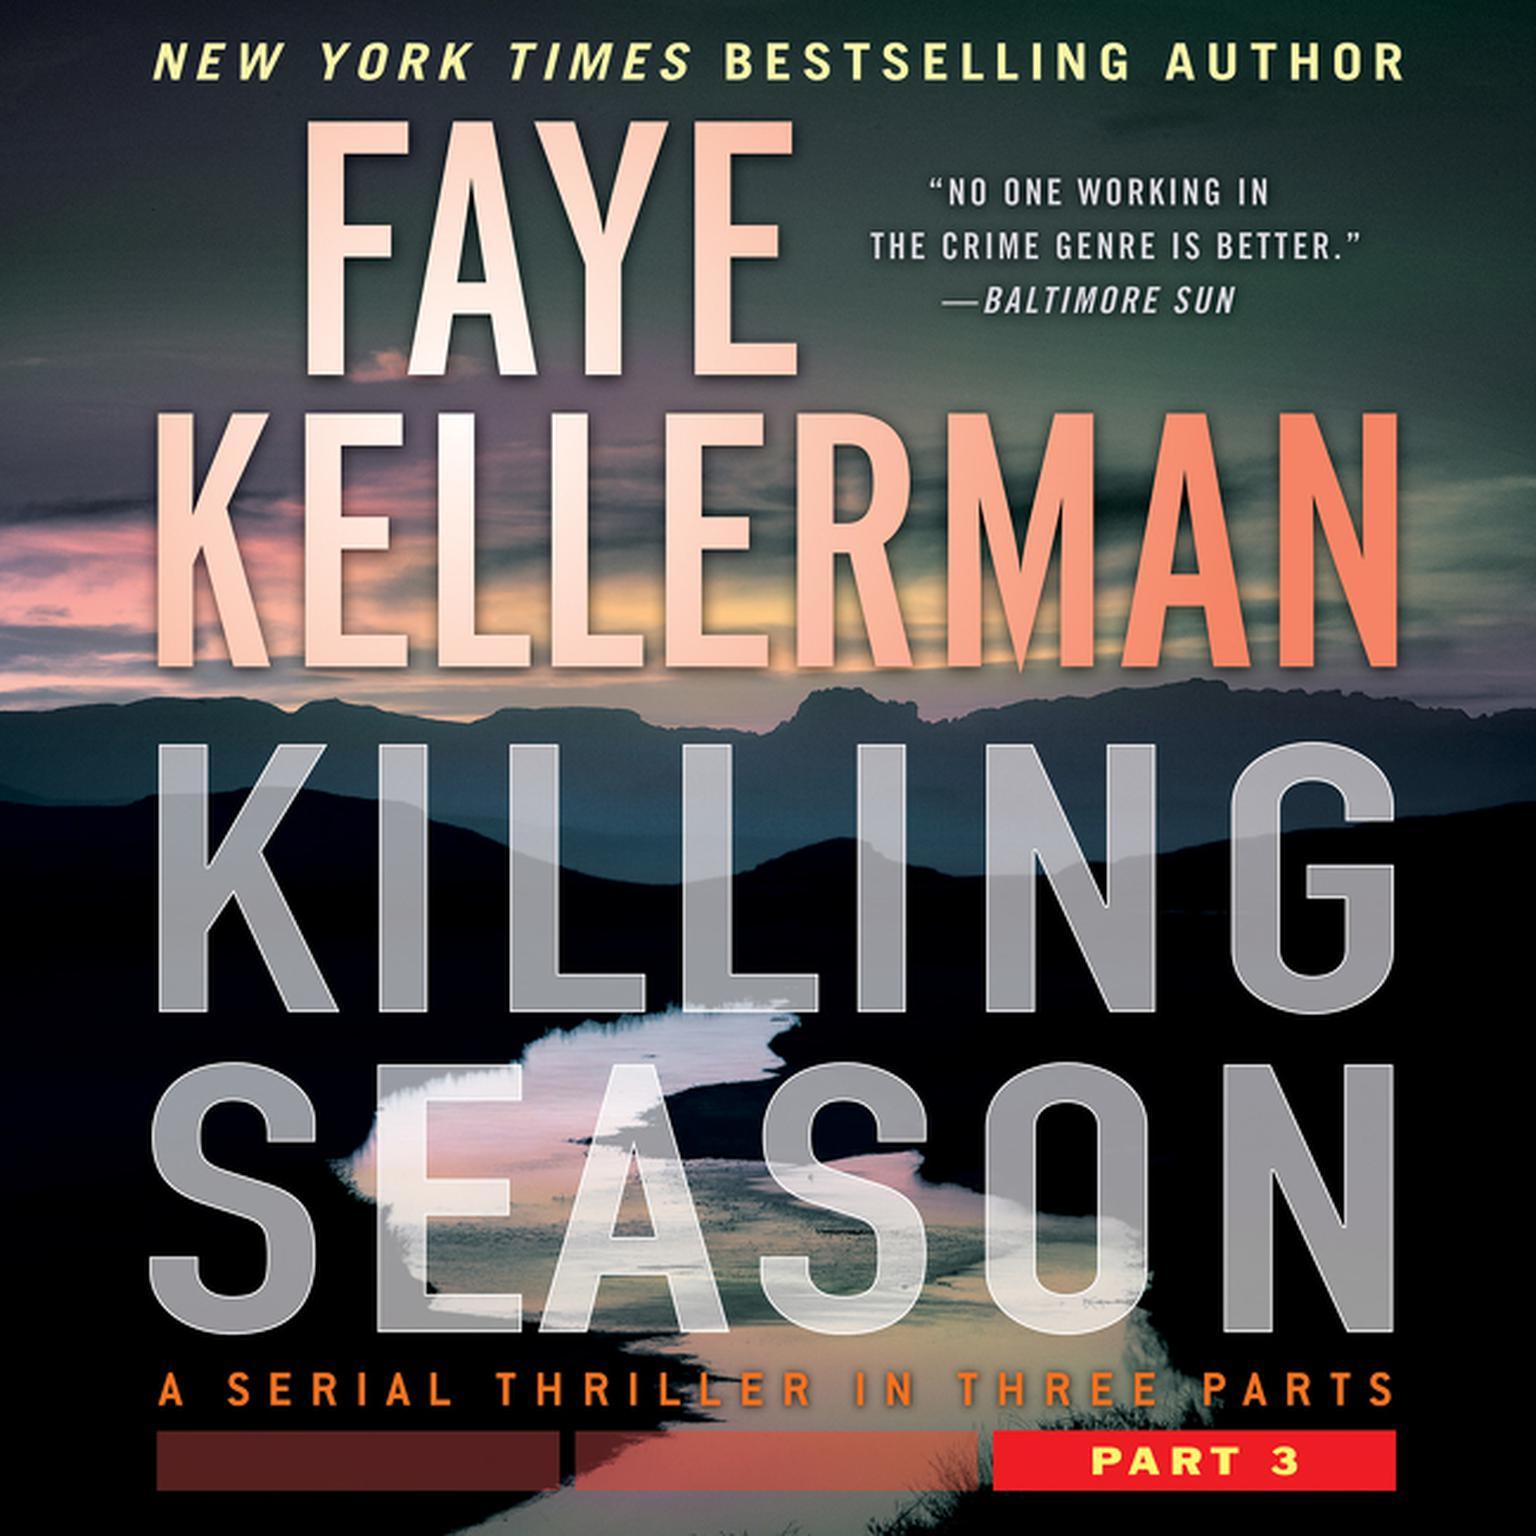 Killing Season Part 3: A Serial Thriller in Three Parts Audiobook, by Faye Kellerman